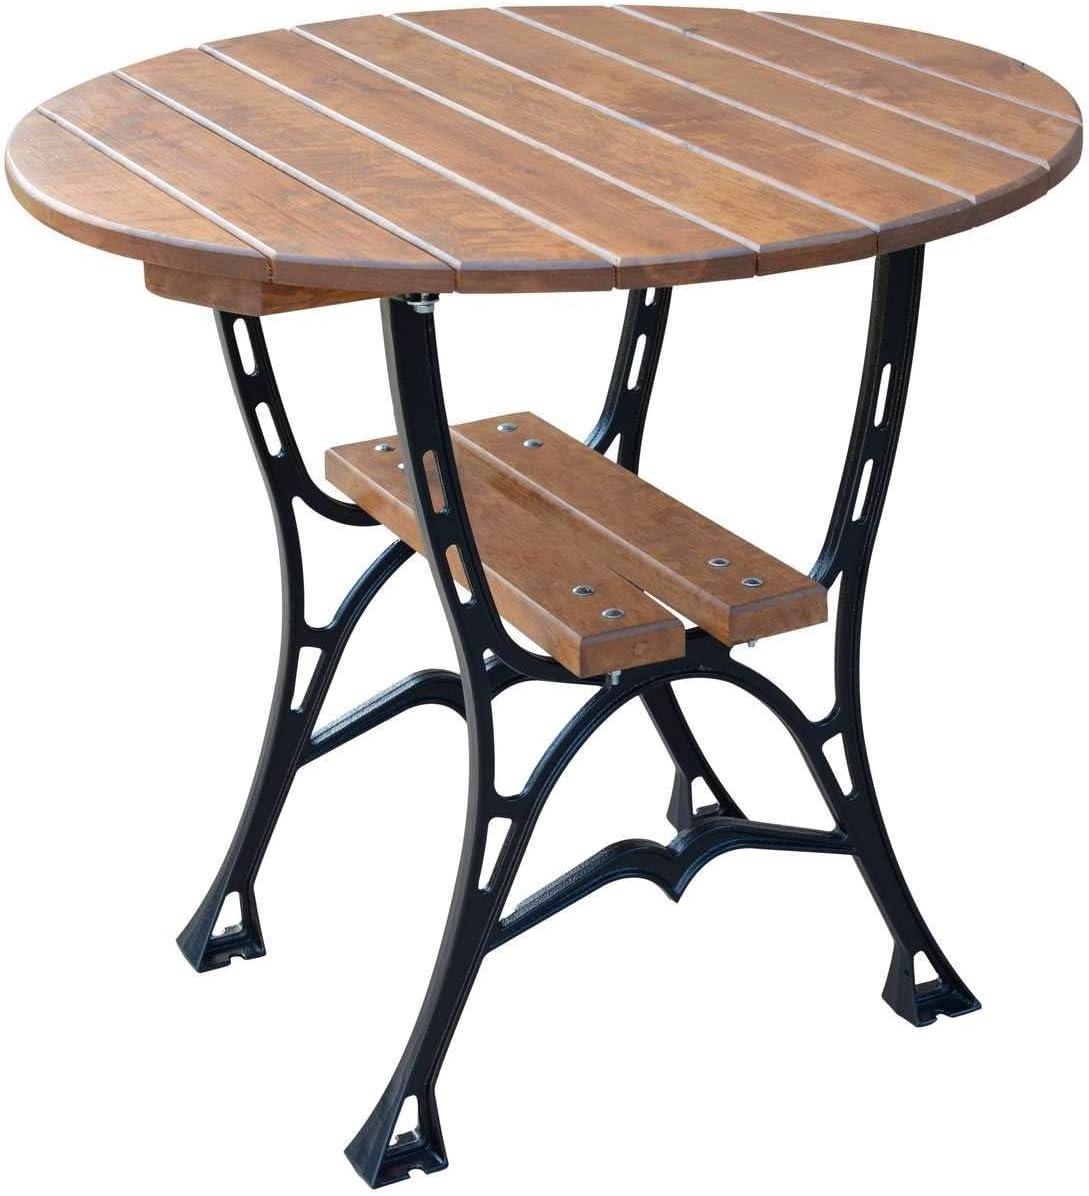 Krakwood Round Garden Table Wooden Round Outdoor Dining Table Deluxe